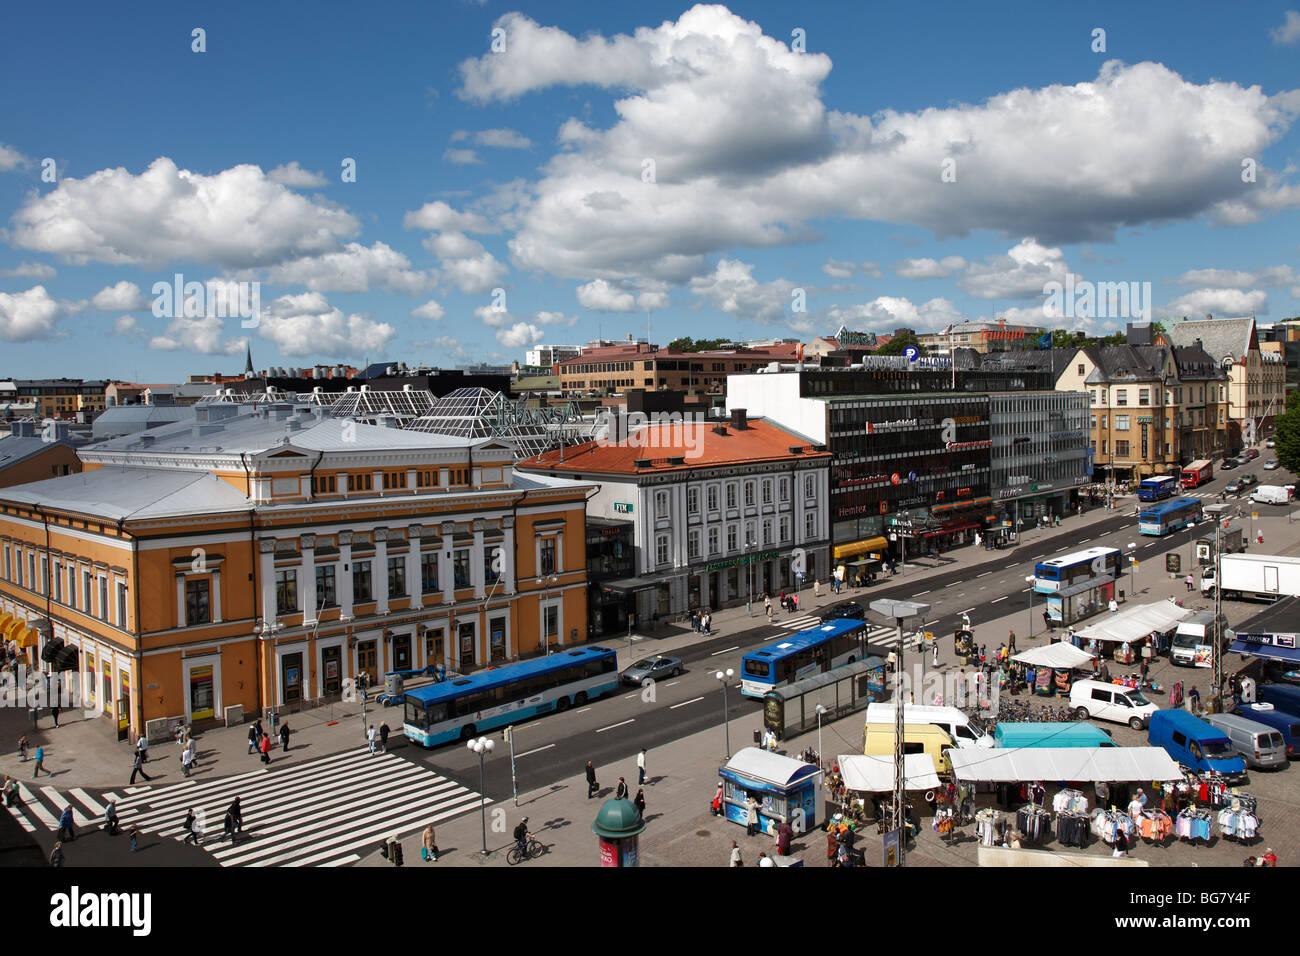 Finland Region of Finland Proper Western Finland Turku Market Square Kauppatori Square Abo Svenska Teater The Swedish - Stock Image